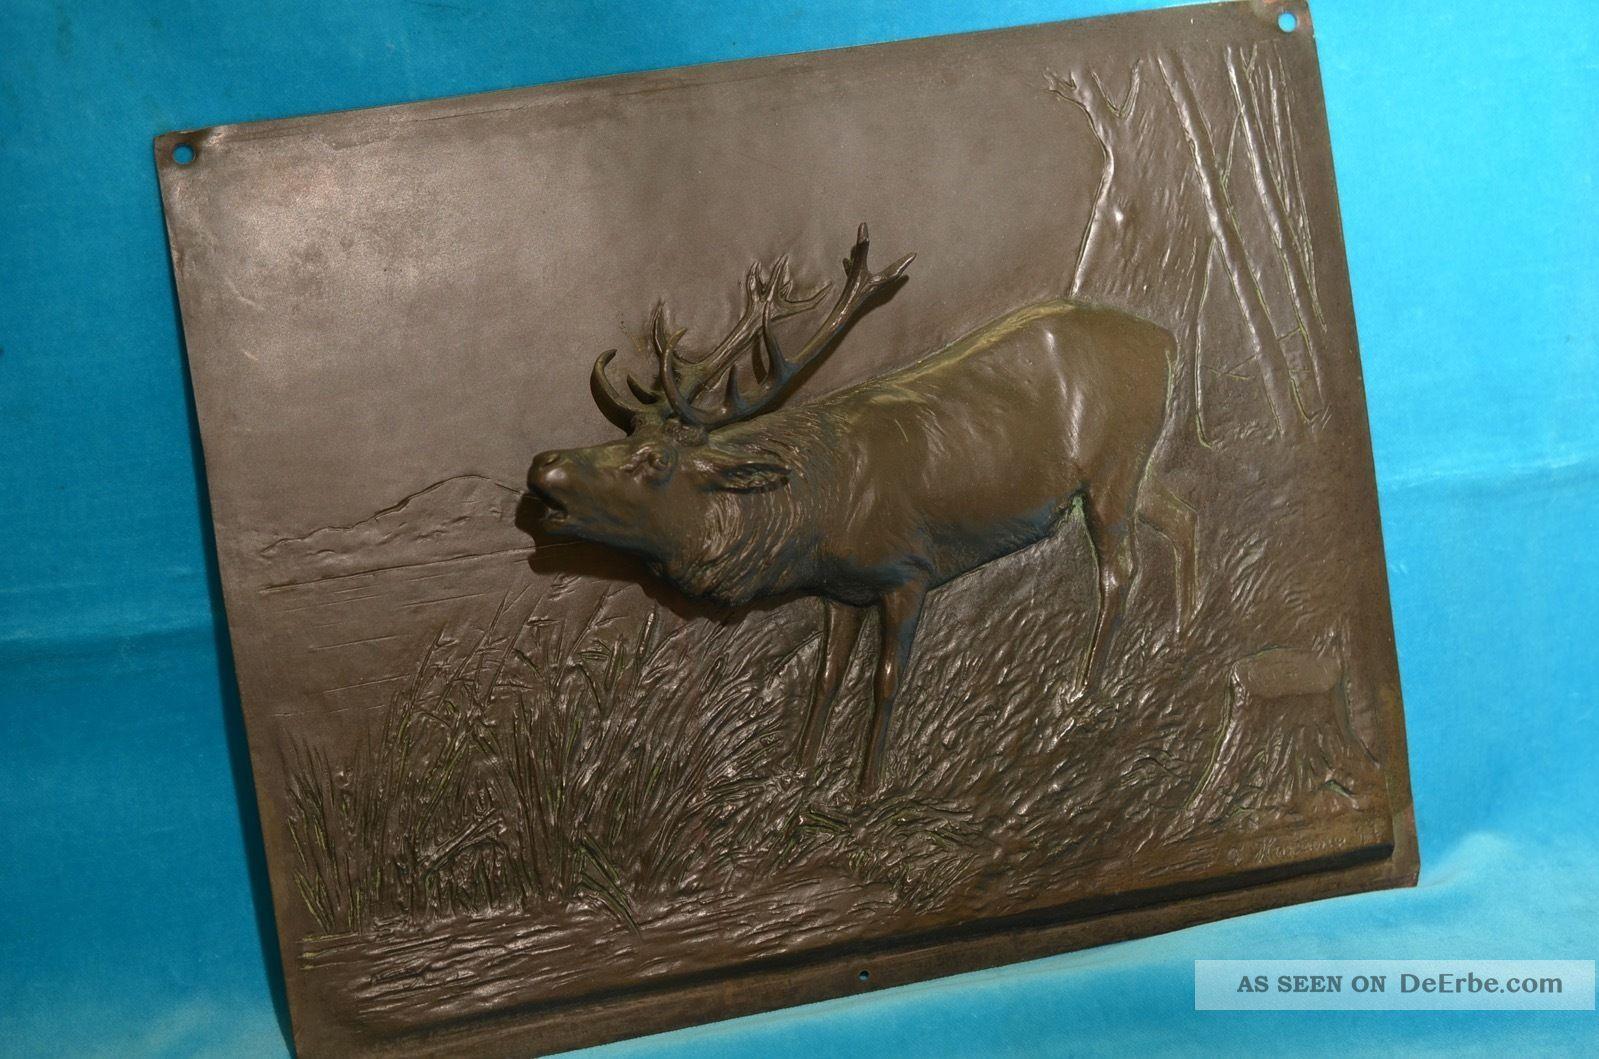 Schönes Dekoratives Dreidimensionales Bronze Relief Hirsch Jagdbild Bronze Bild